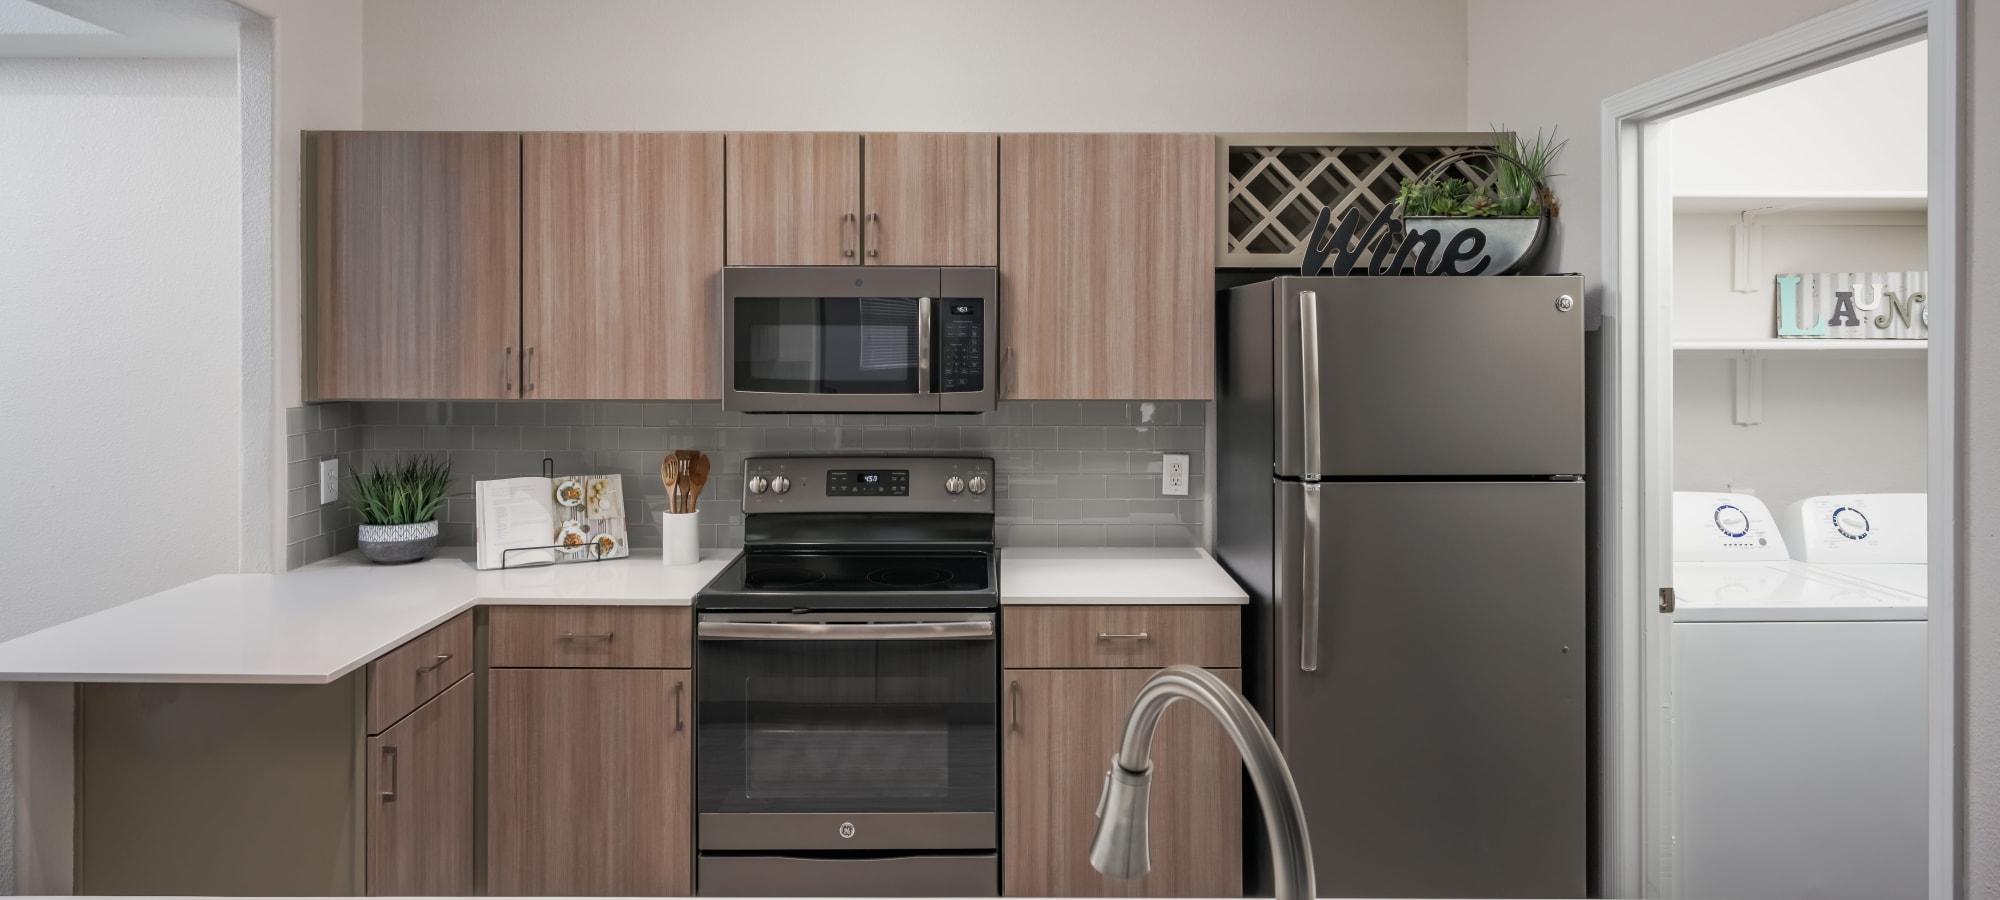 Very sleek kitchen at The Sterling in Gilbert, Arizona